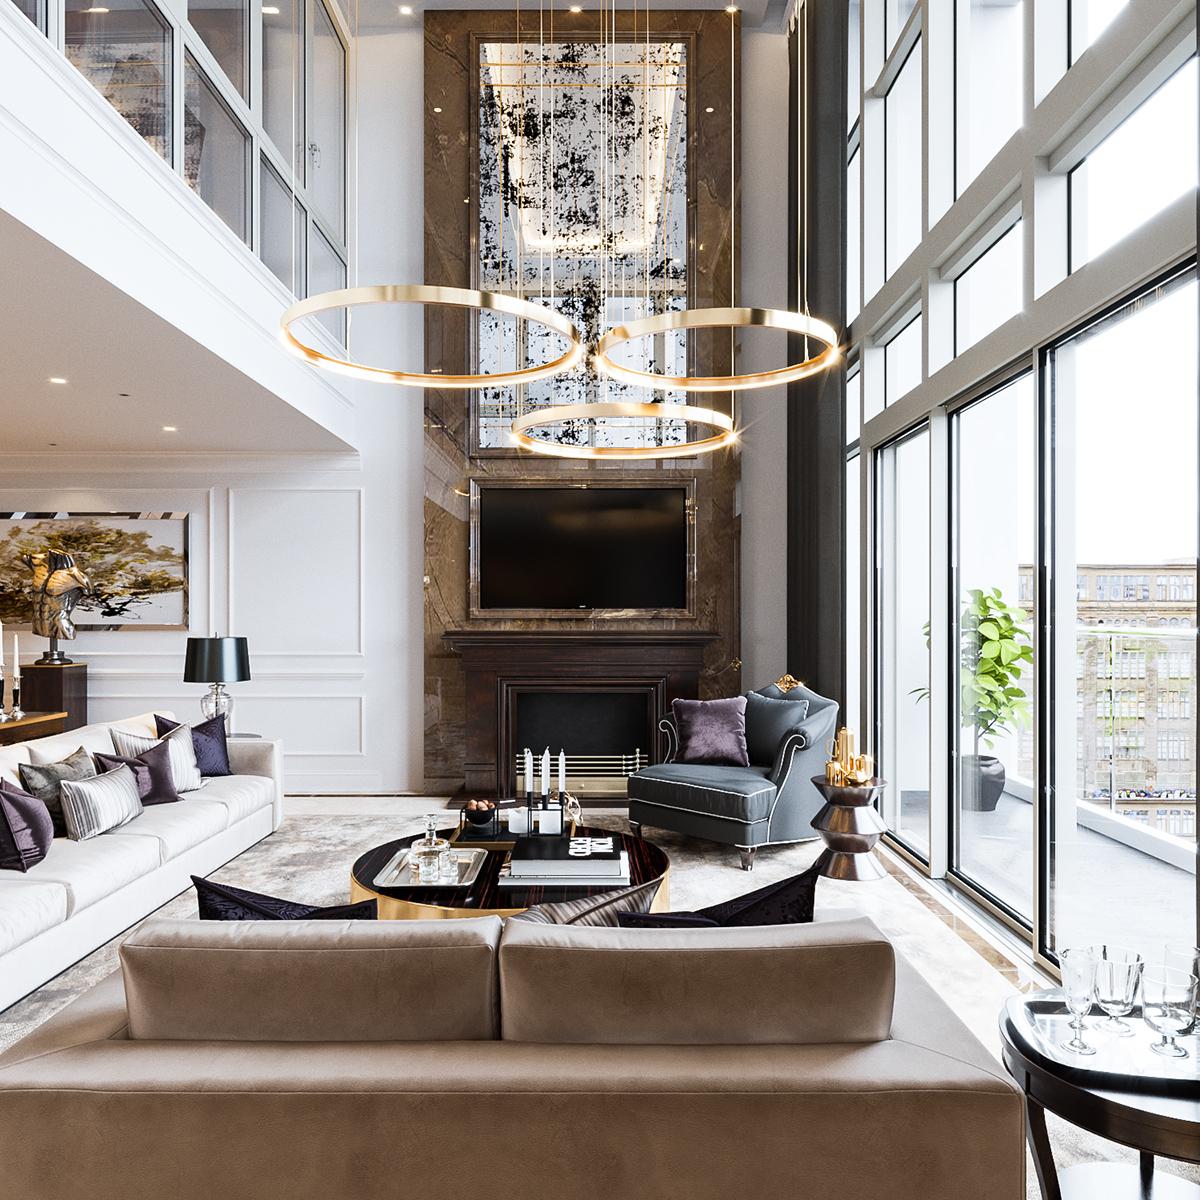 Mandarin Duplex apartment on Behance